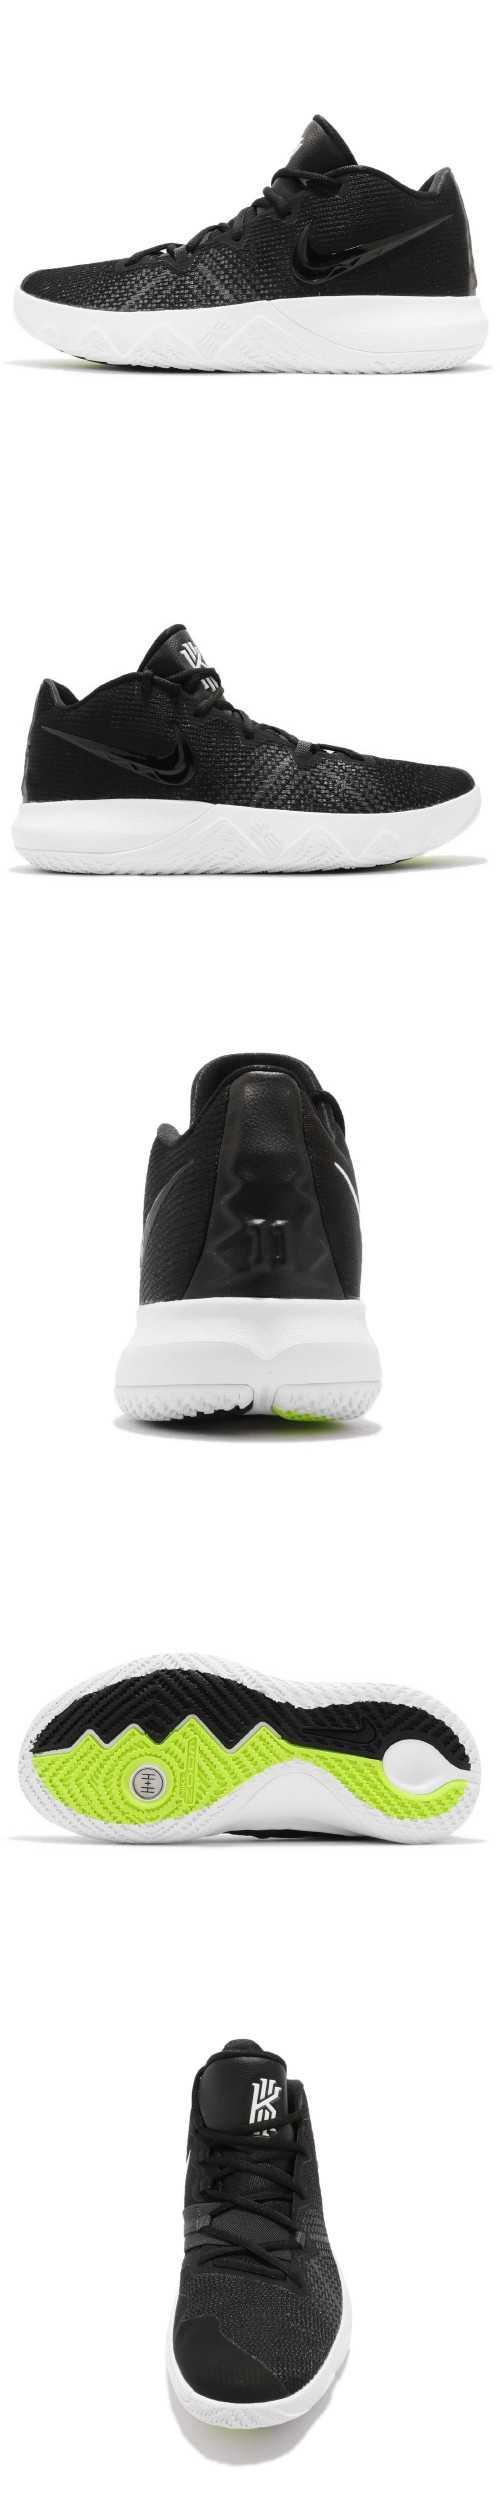 Nike Kyrie Flytrap EP 男鞋